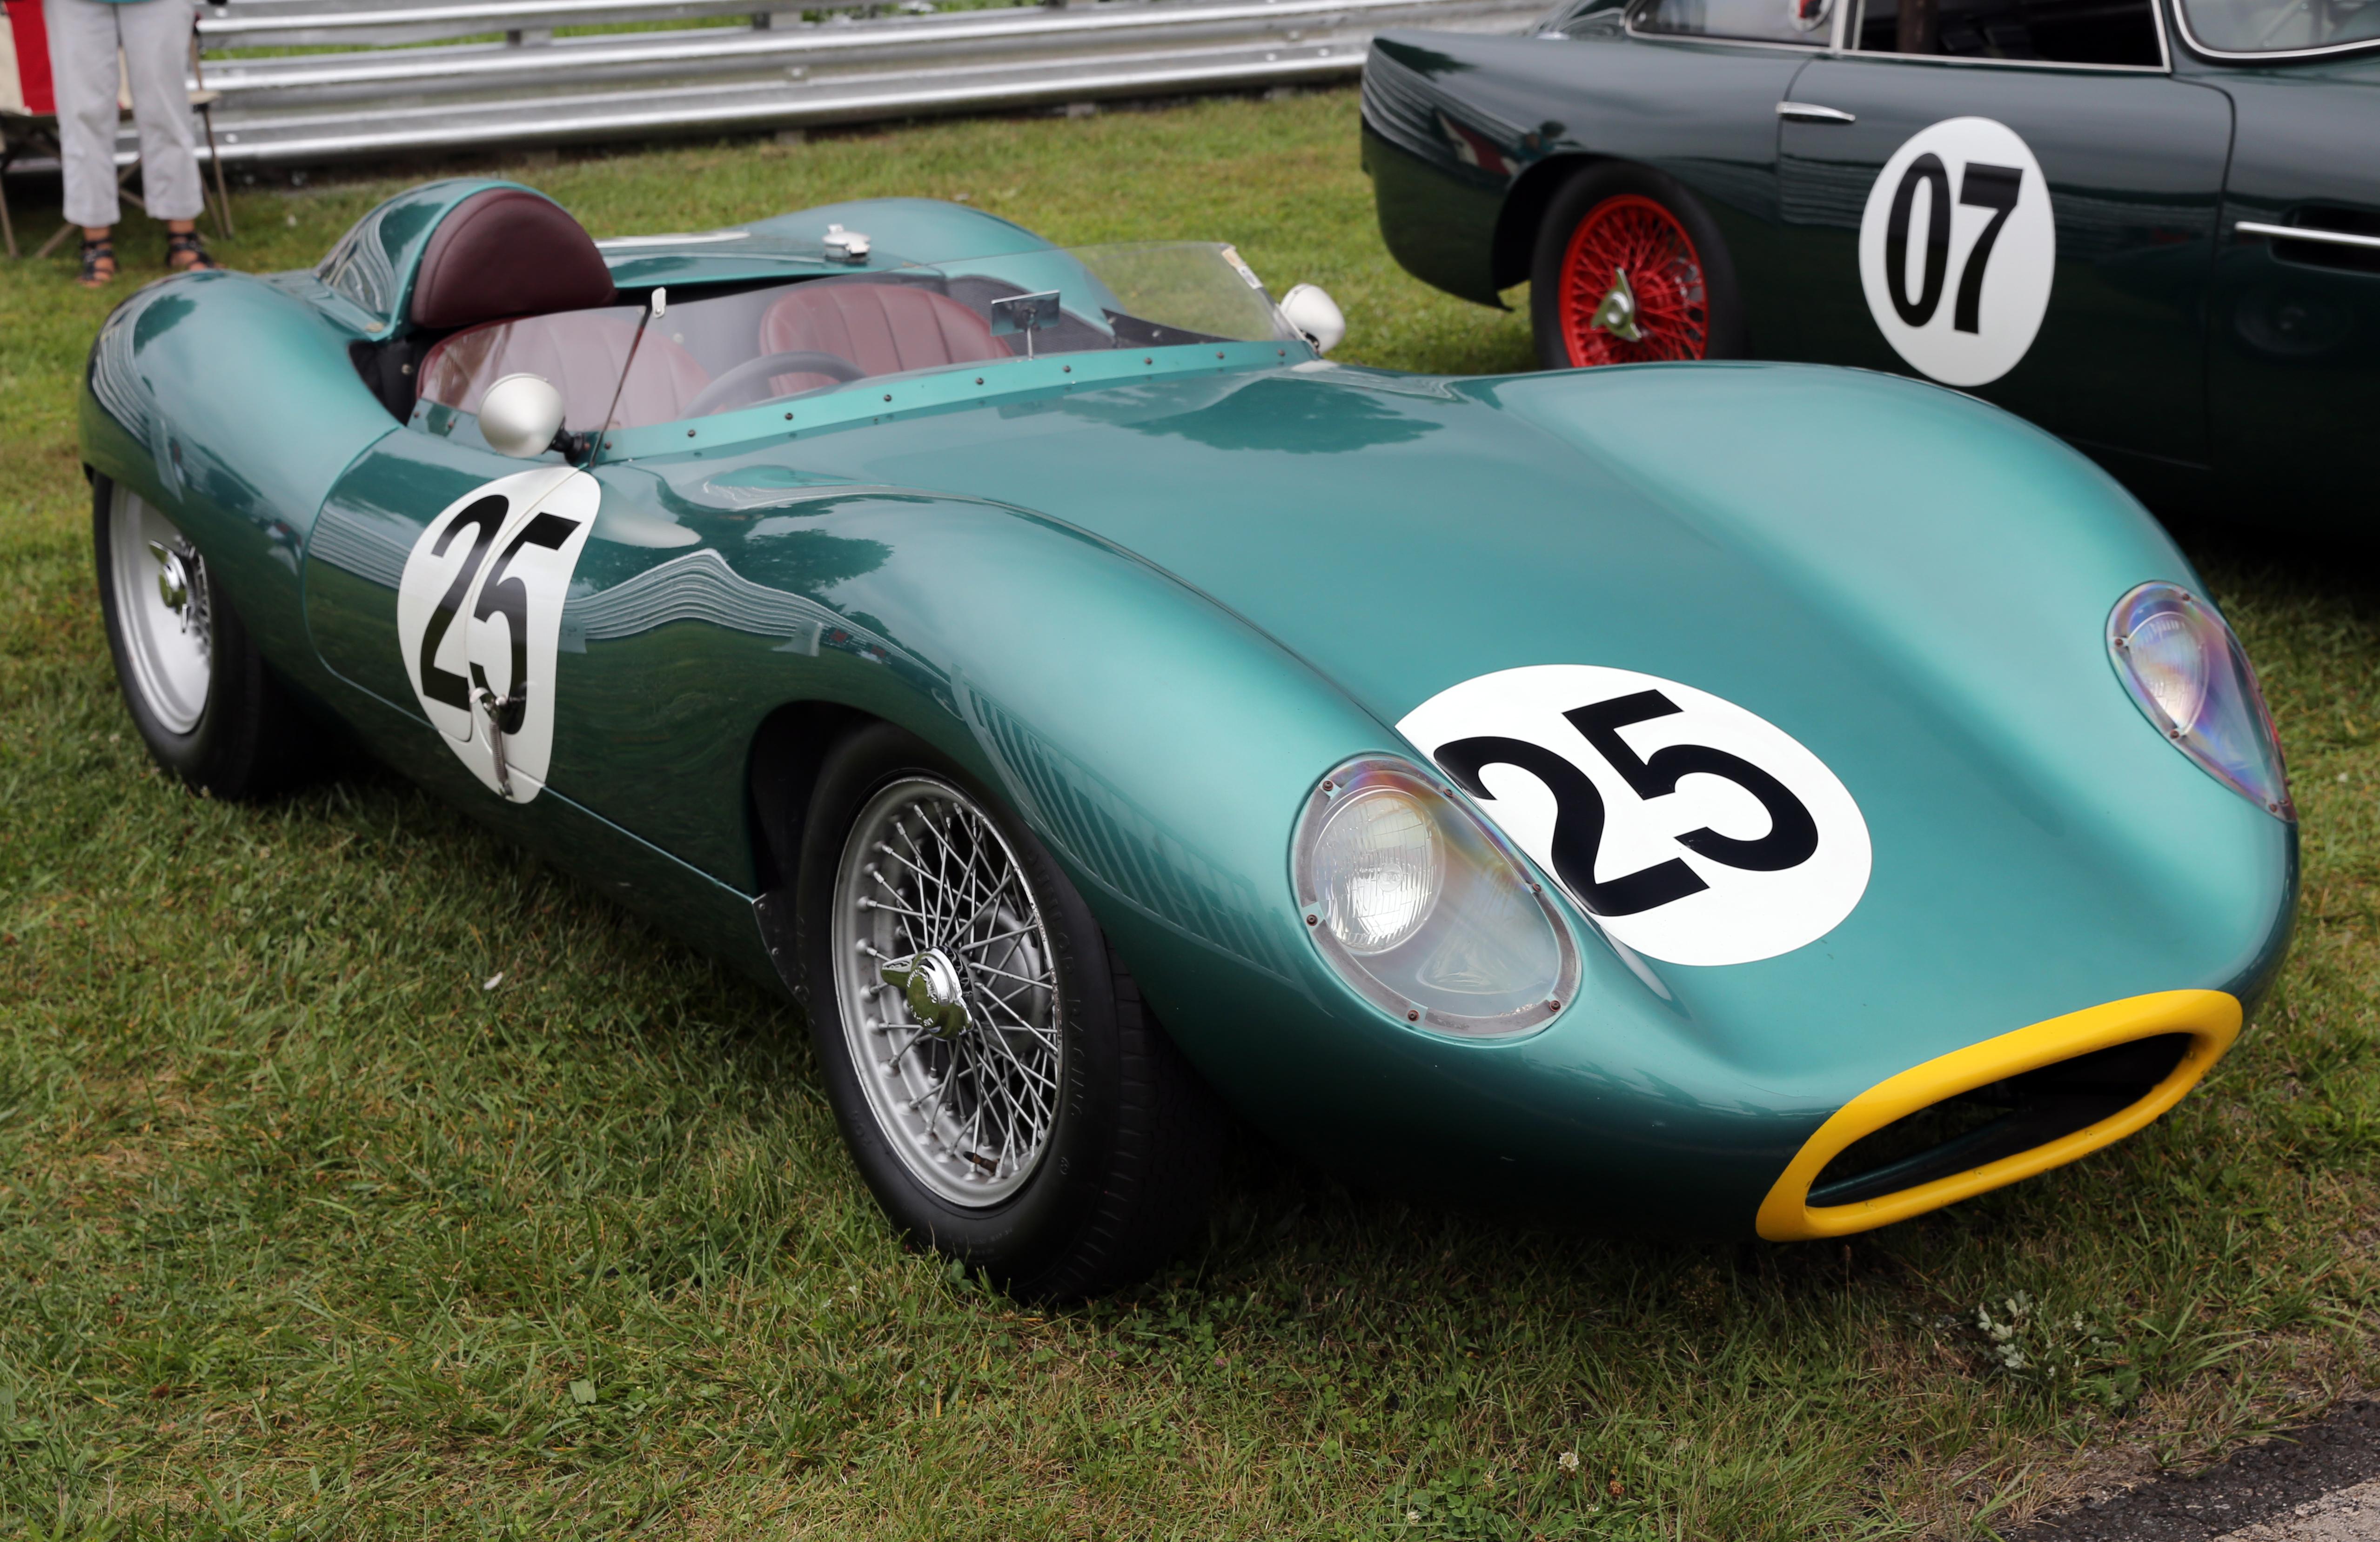 Concours D Elegance >> File:1958 Tojeiro-Climax Mk. II sports racer, Lime Rock.jpg - Wikimedia Commons